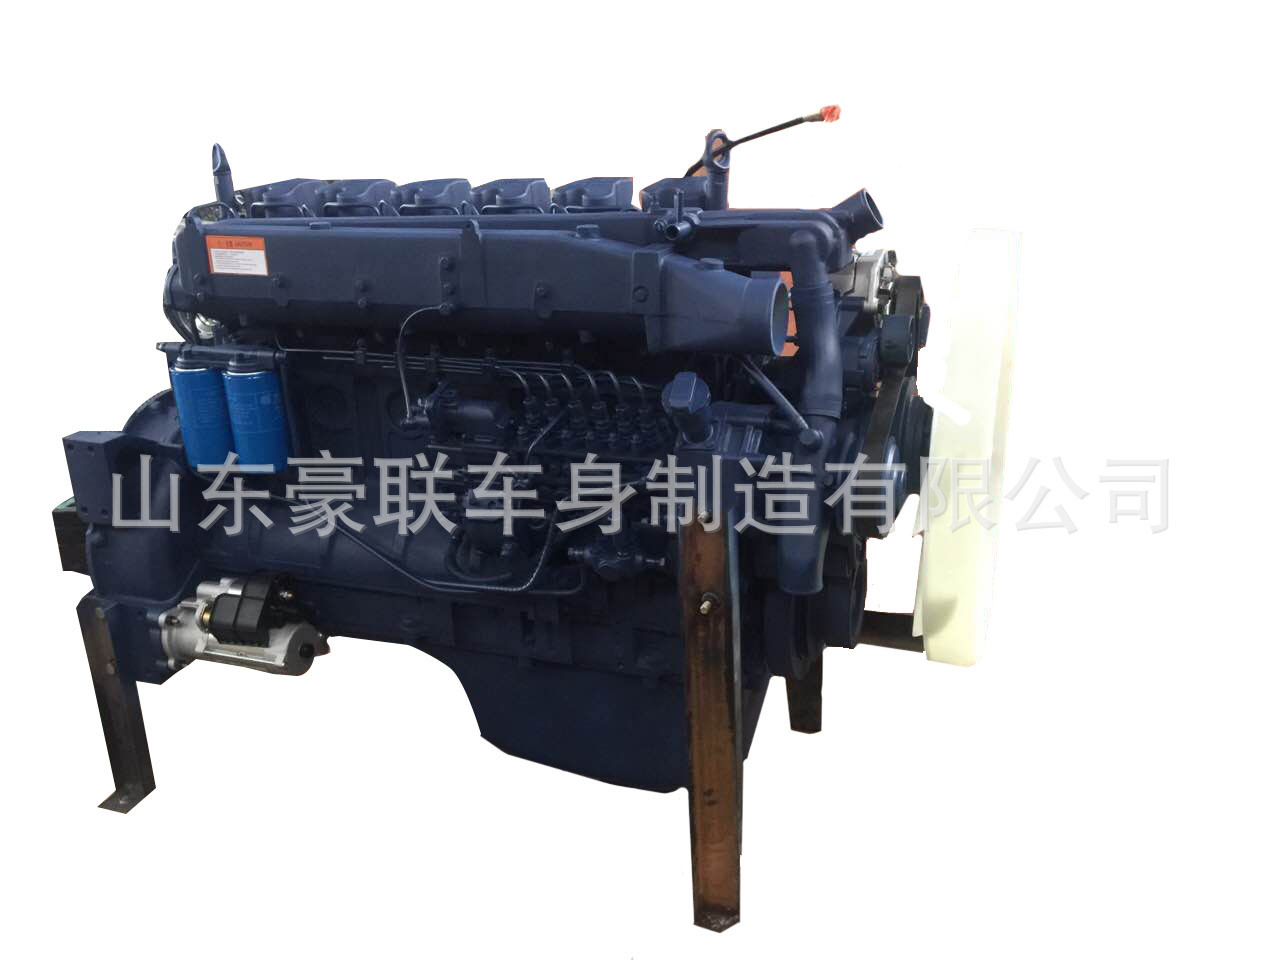 WD618潍柴机器总成.jpg